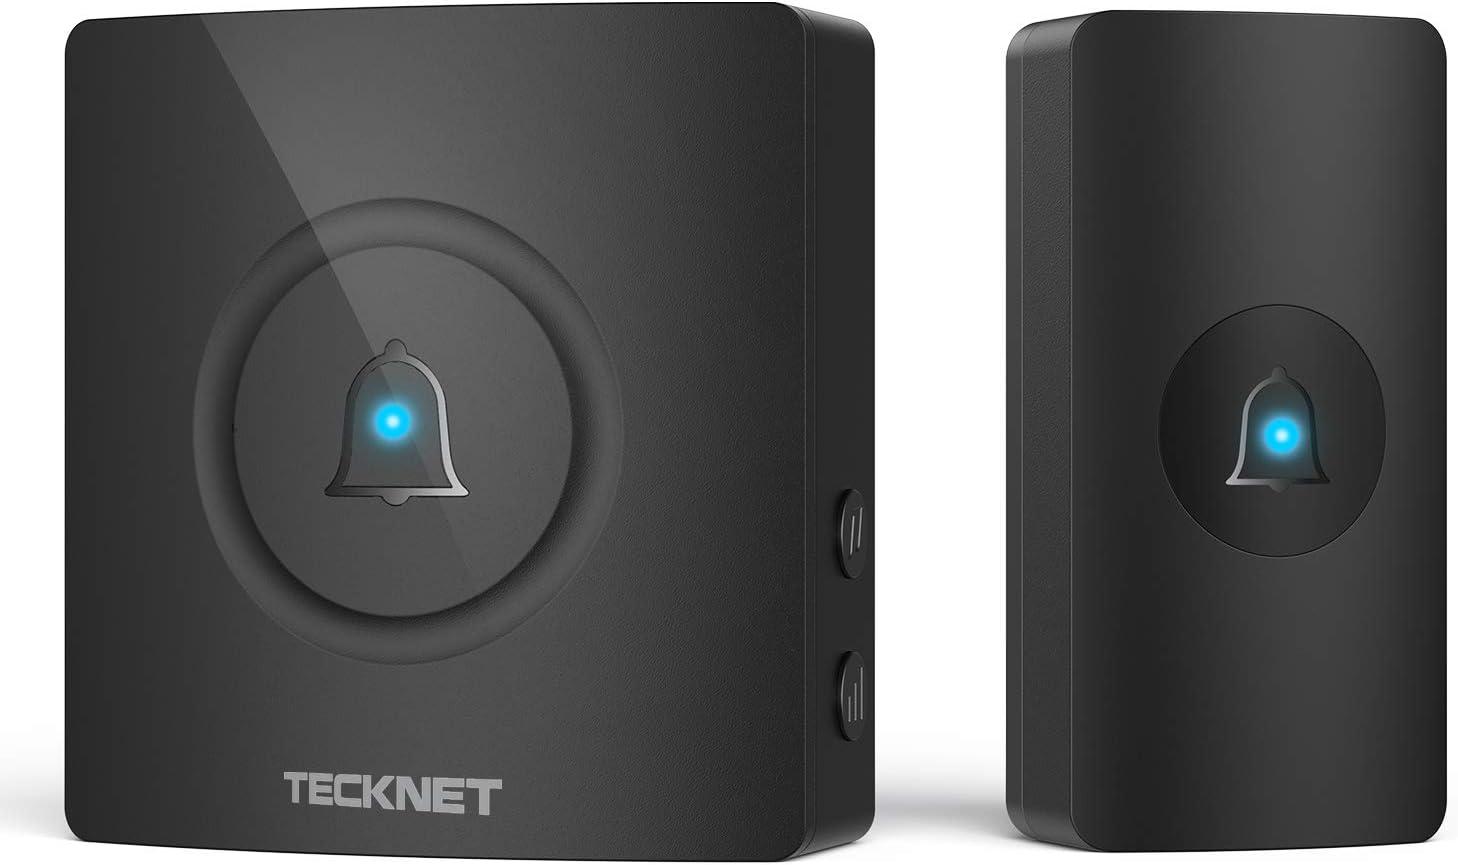 Wireless Doorbell, TeckNet Waterproof Door Bell Chime Kit Operating at 1000 Feet with 38 Melodies, 4 Volume Levels & LED Light Flash (Black)